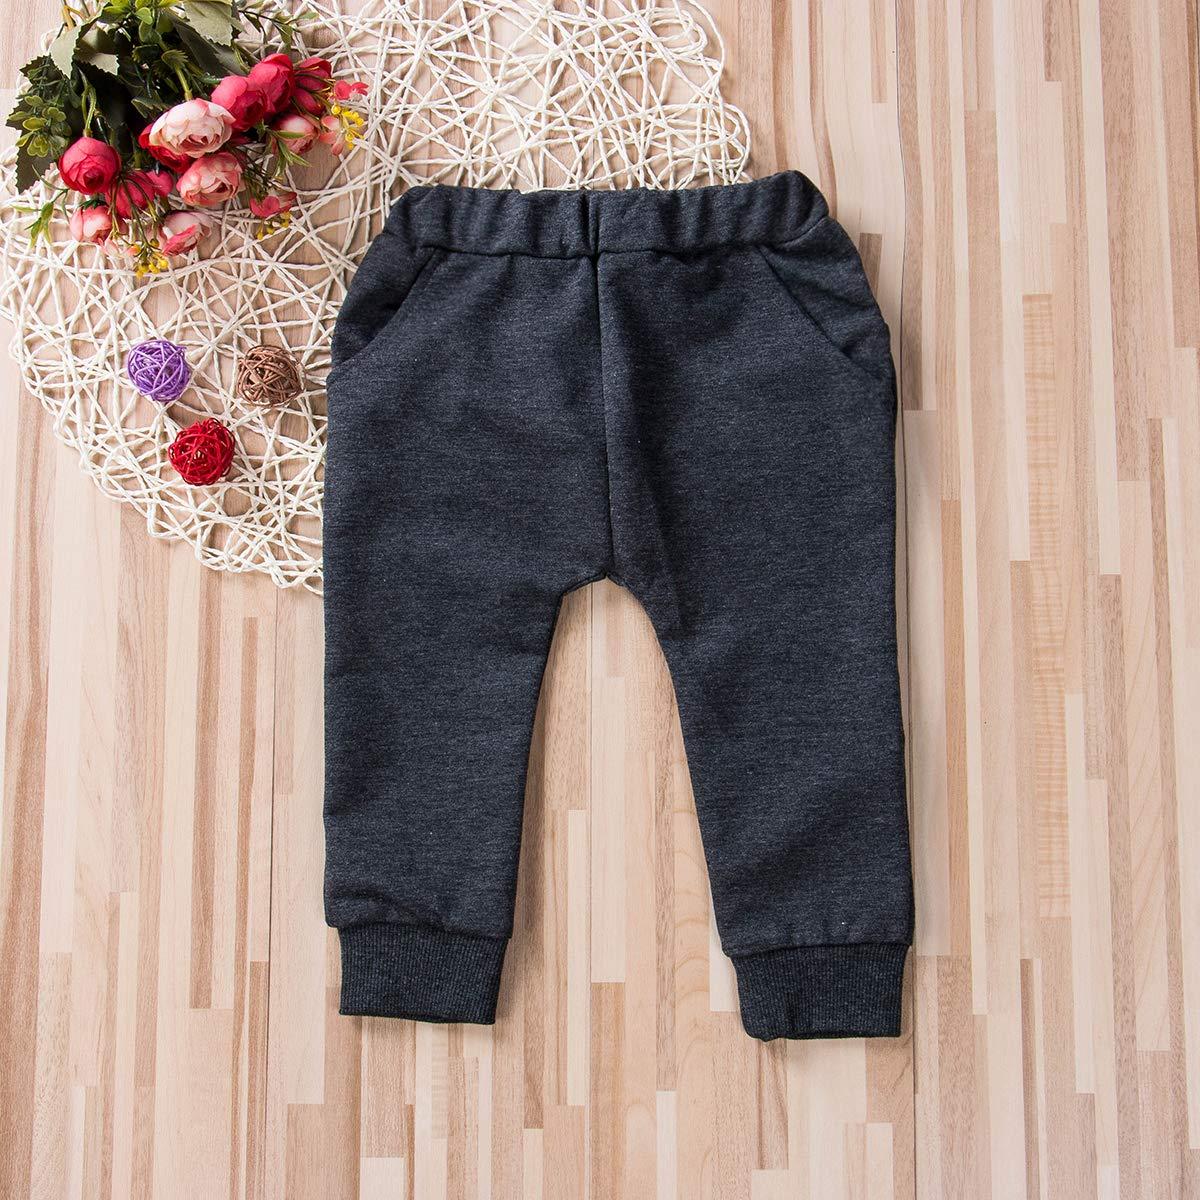 yiguanguan Baby Boys Pants Cartoon Shark Tongue Leggings Trousers Harem Pants for 0-4 Years Old Kids